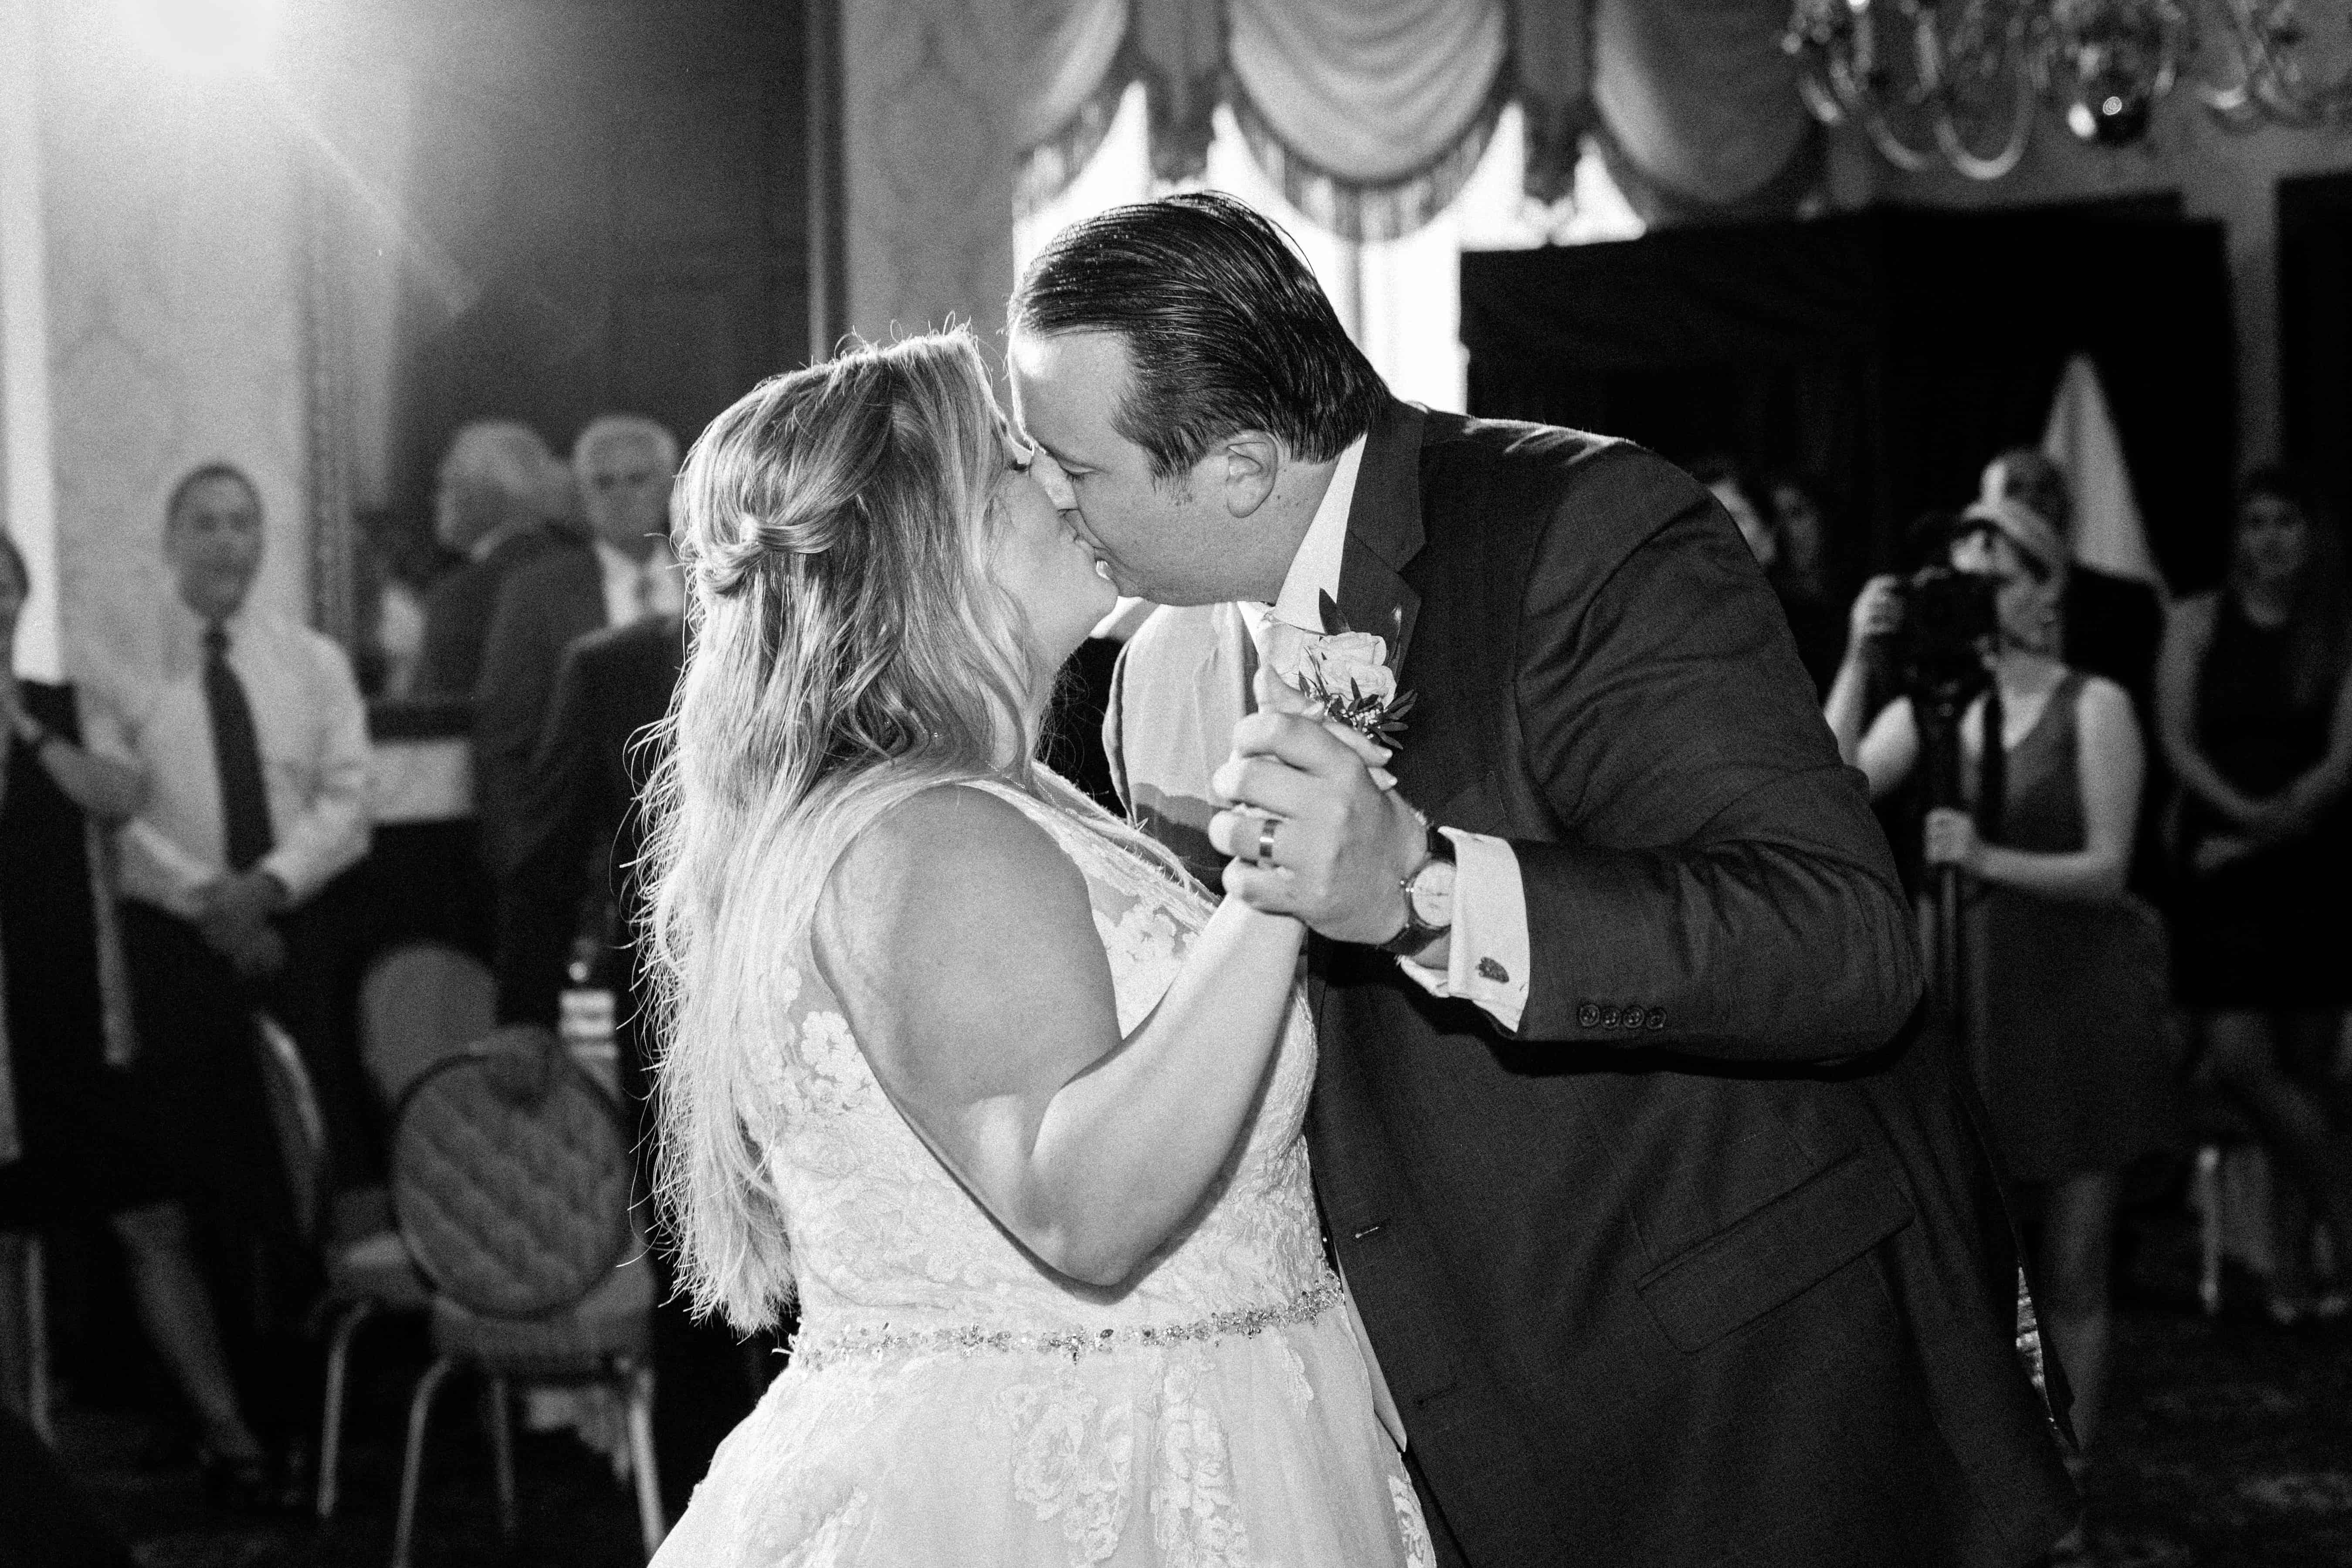 First dance kiss in Prince William ballroom at Nassau Inn wedding